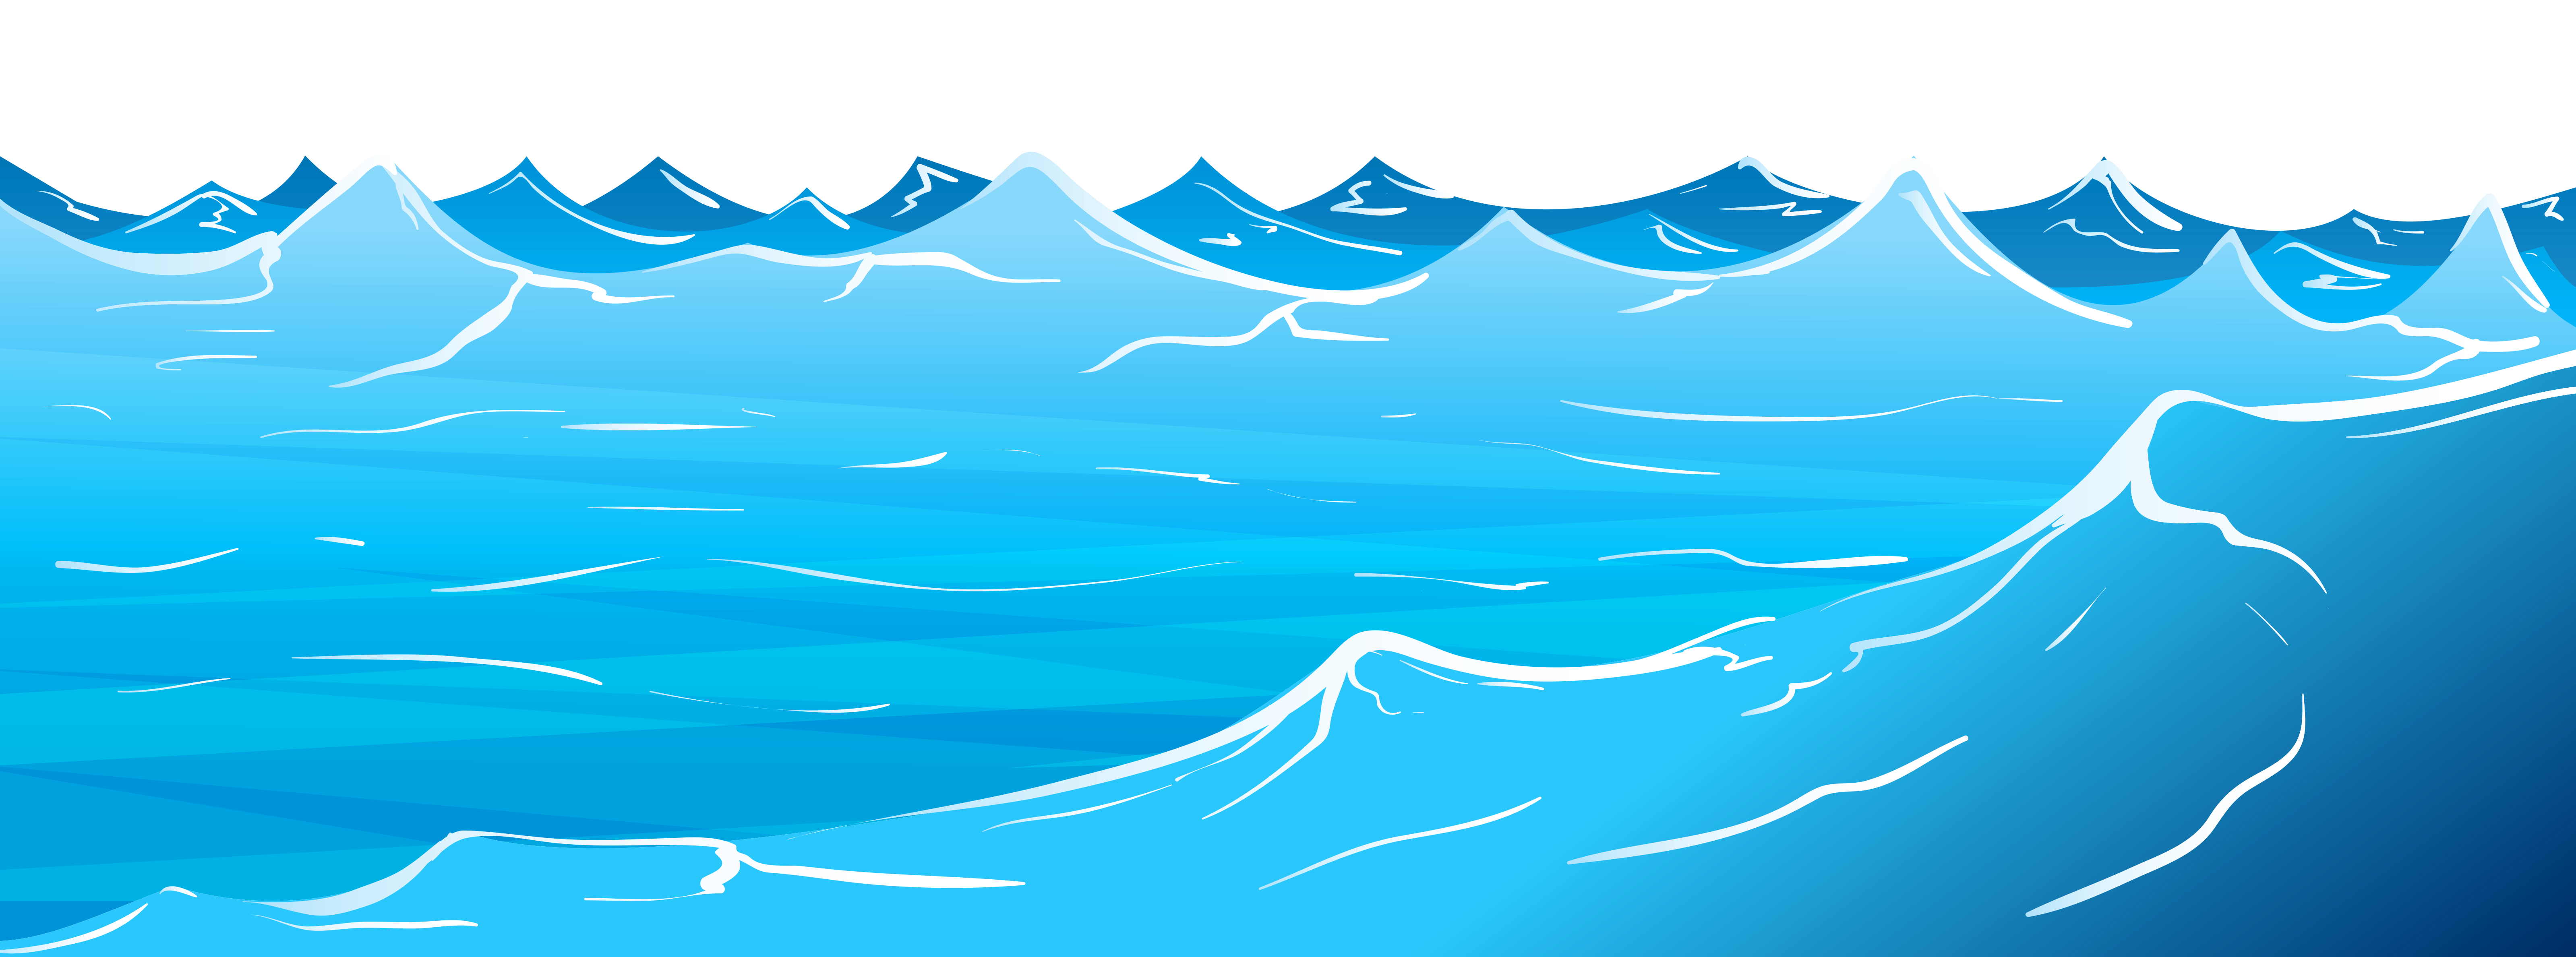 Free Ocean Clipart